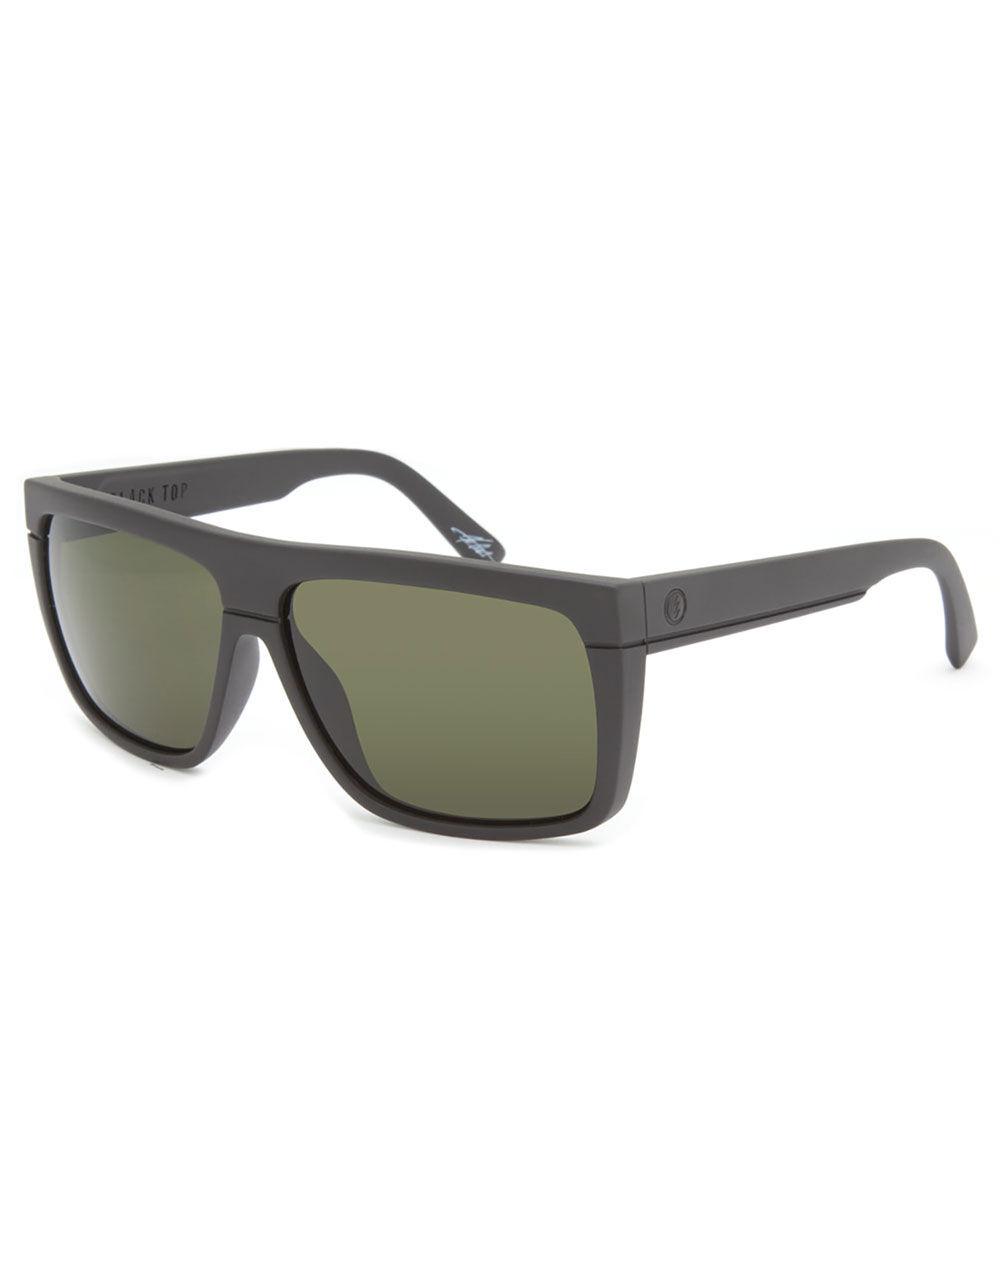 ELECTRIC Black Top Sunglasses